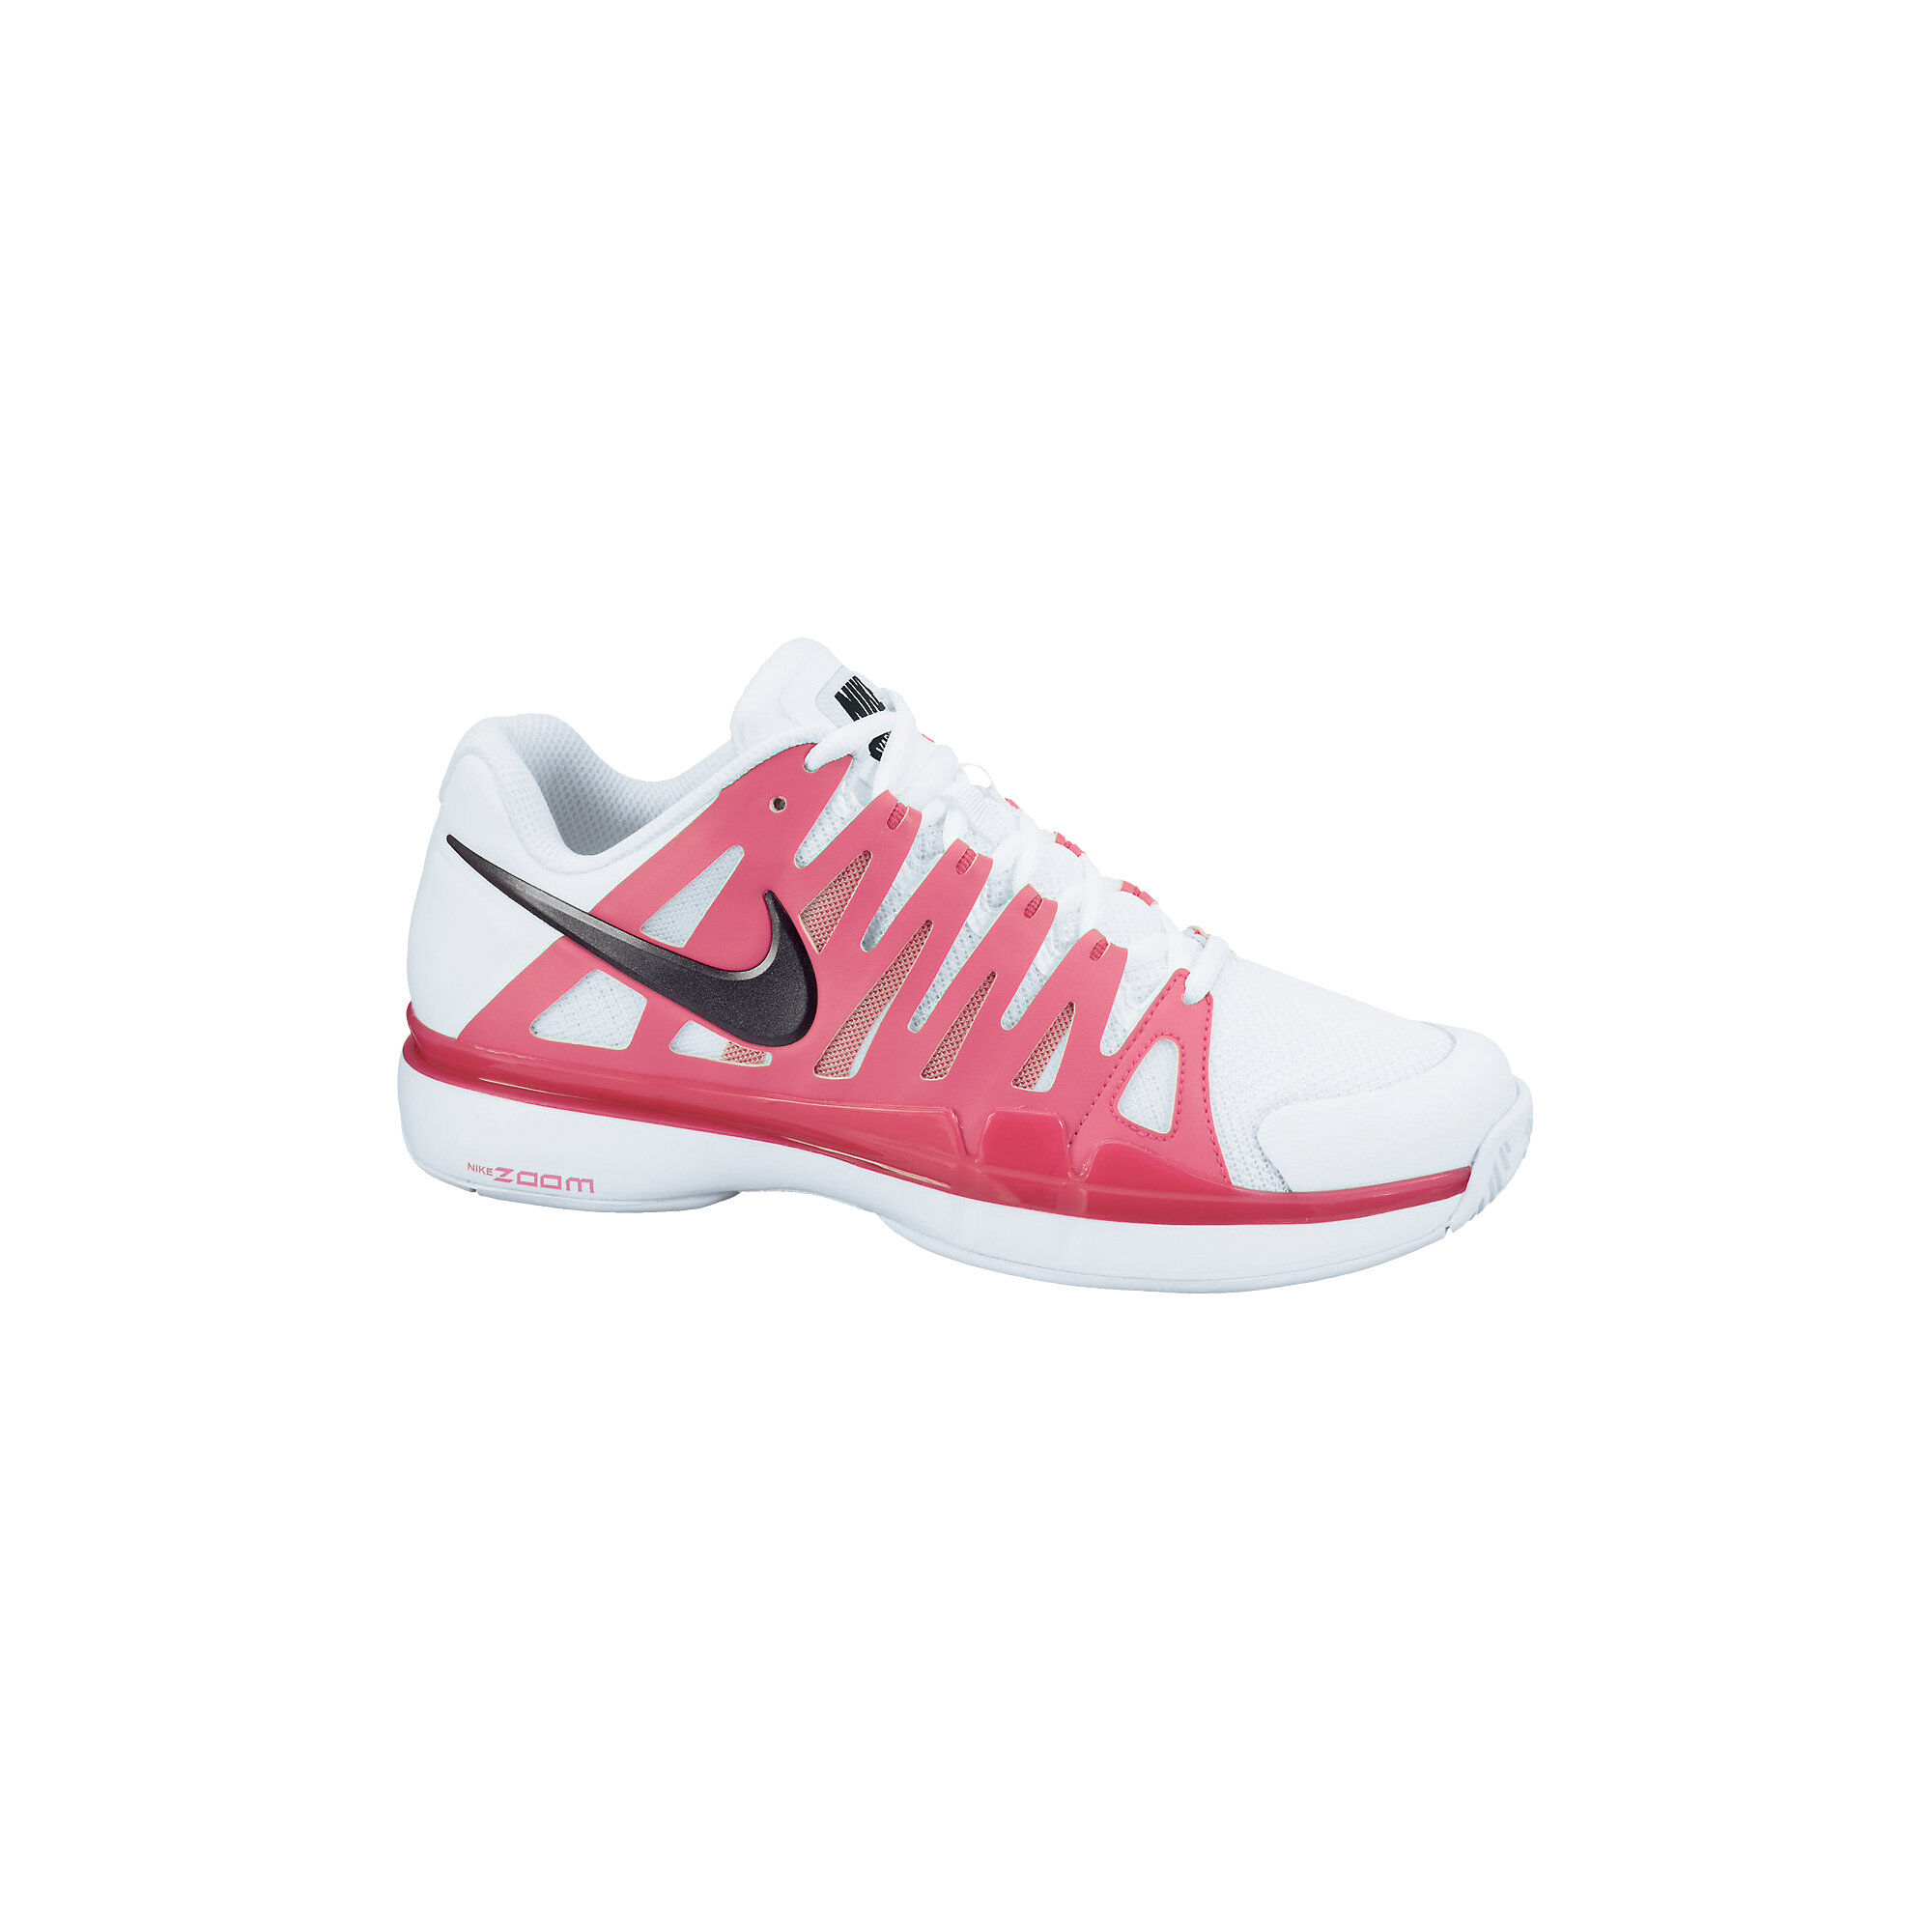 Nike Women's Zoom Vapor Tour 9